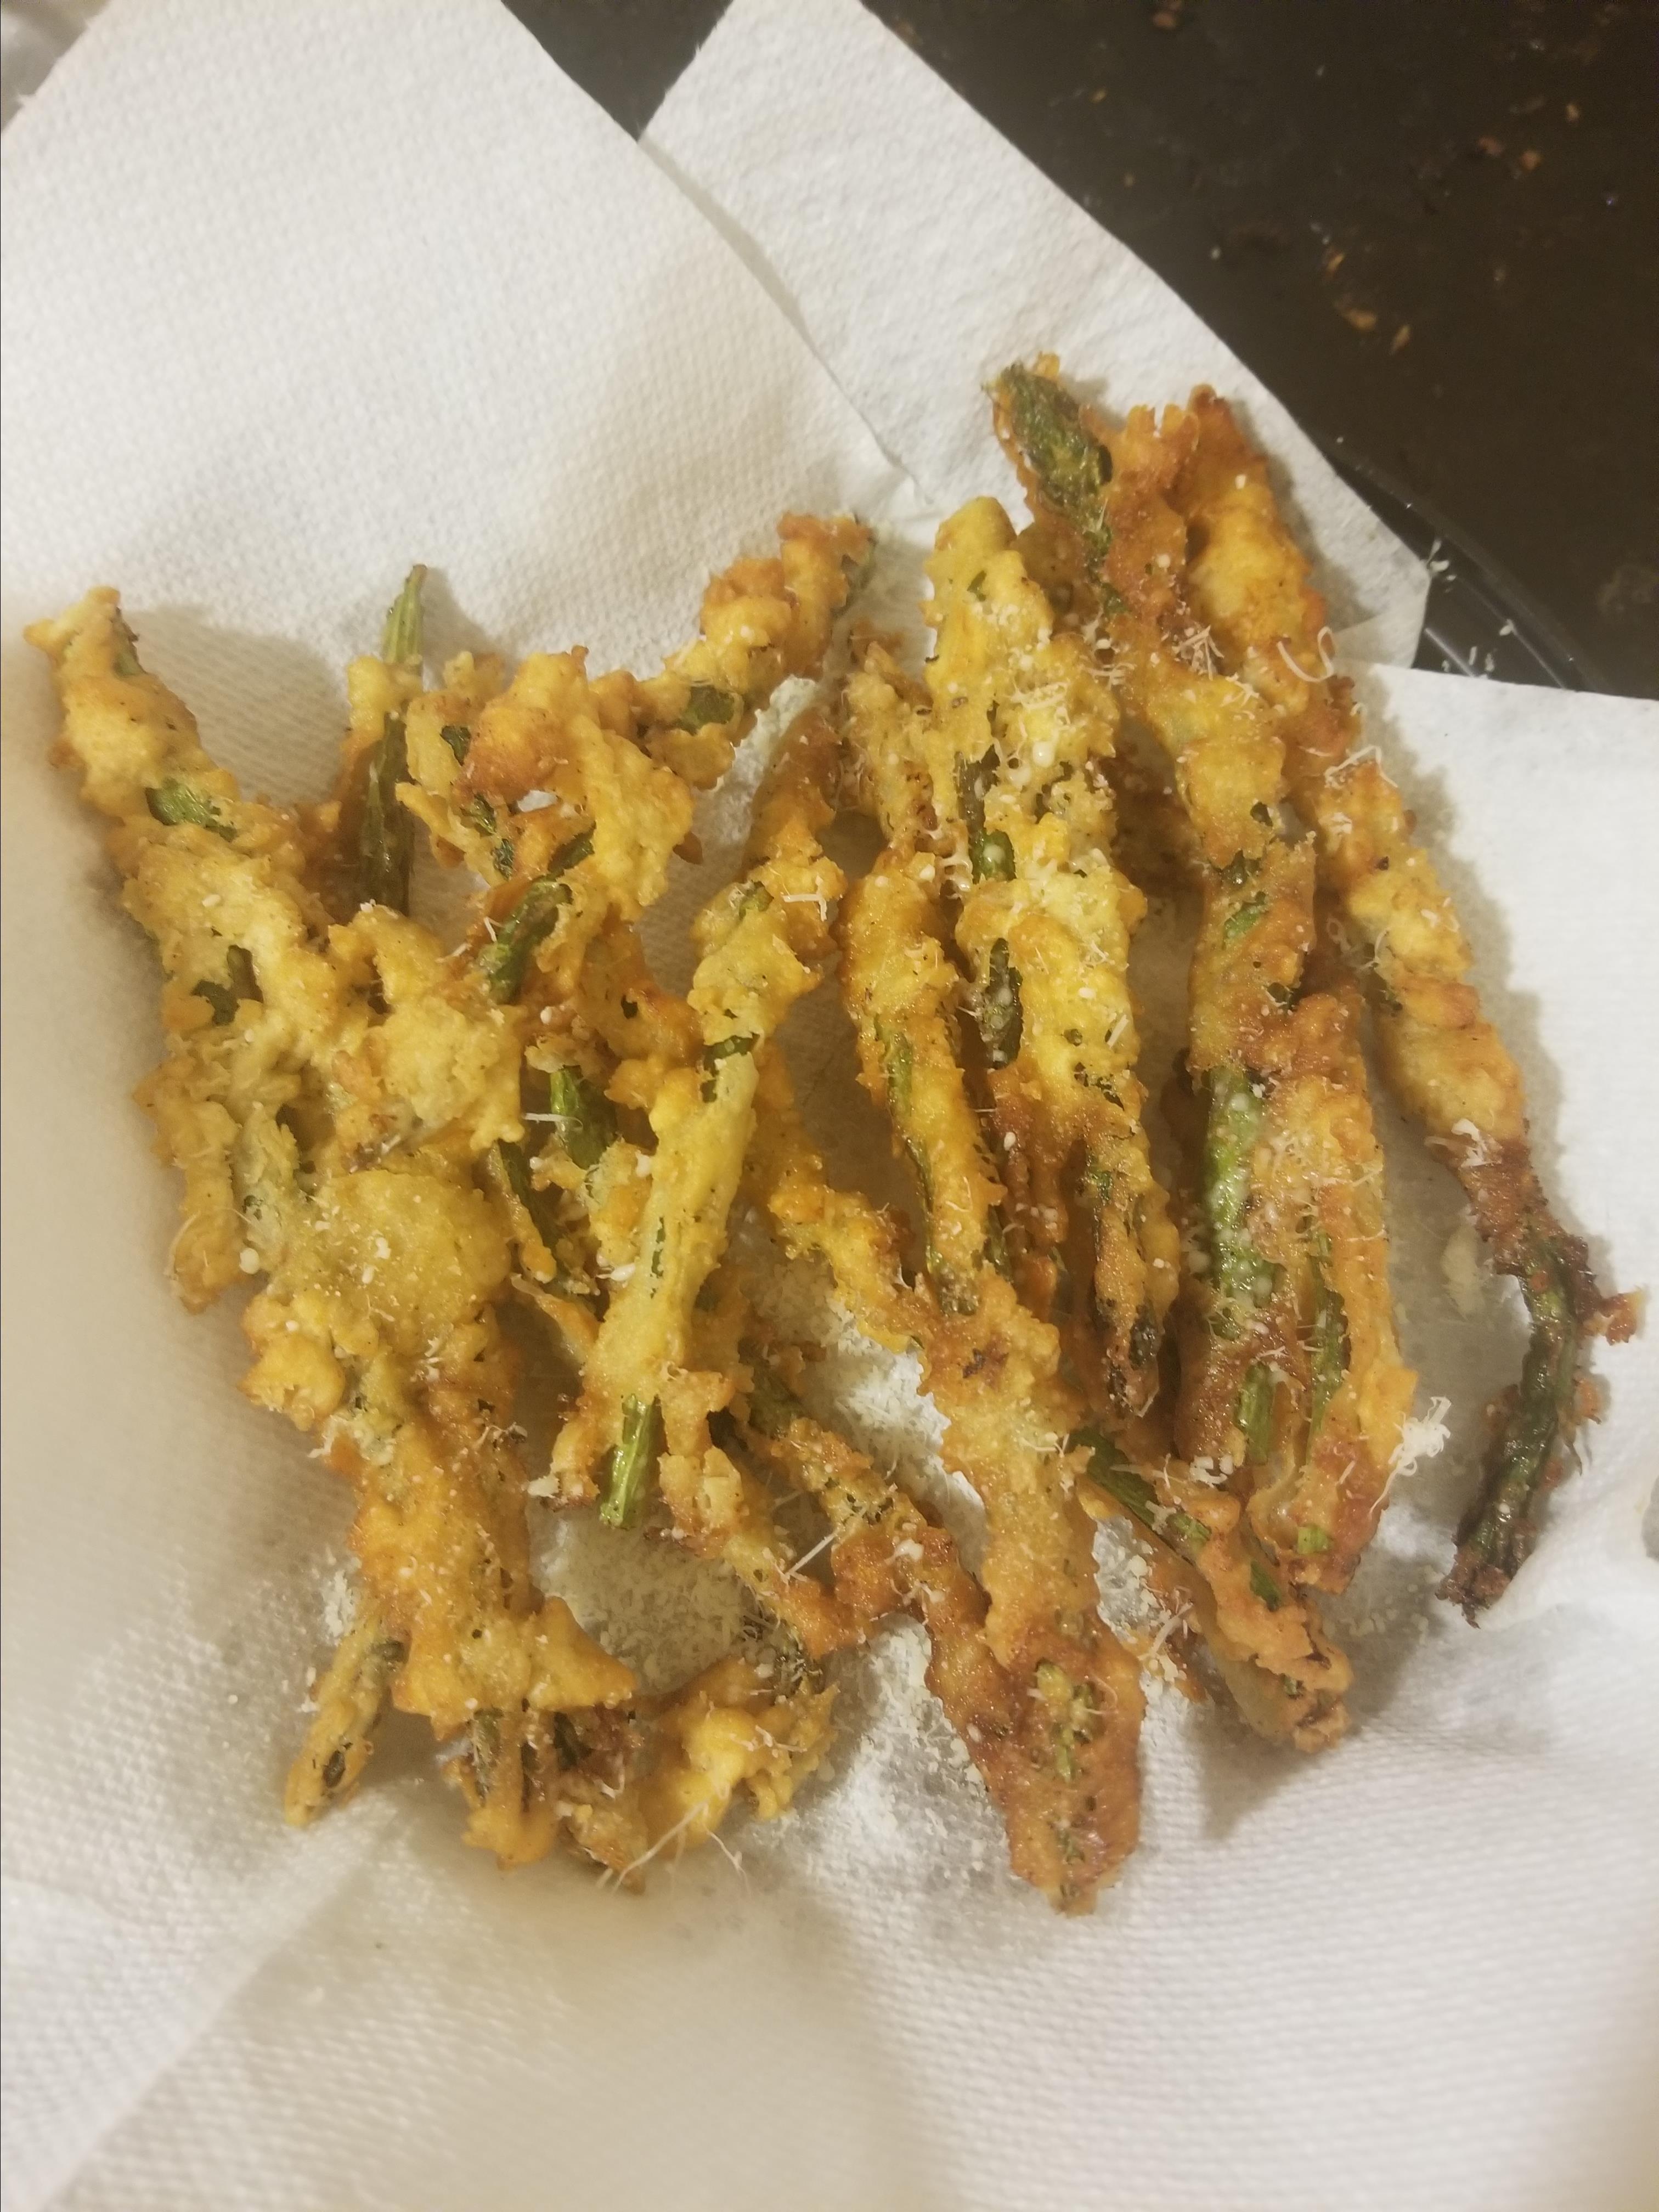 Fried Asparagus Sticks Nora Victorino